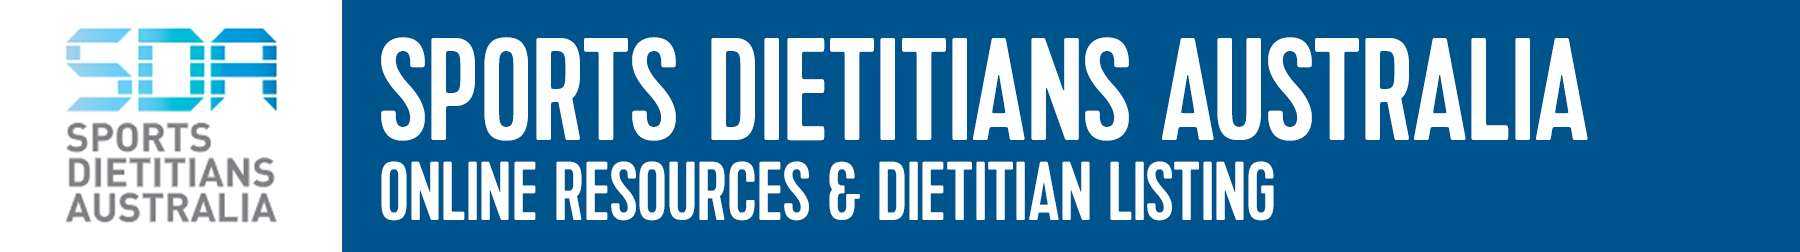 Sport Dietitians Australia